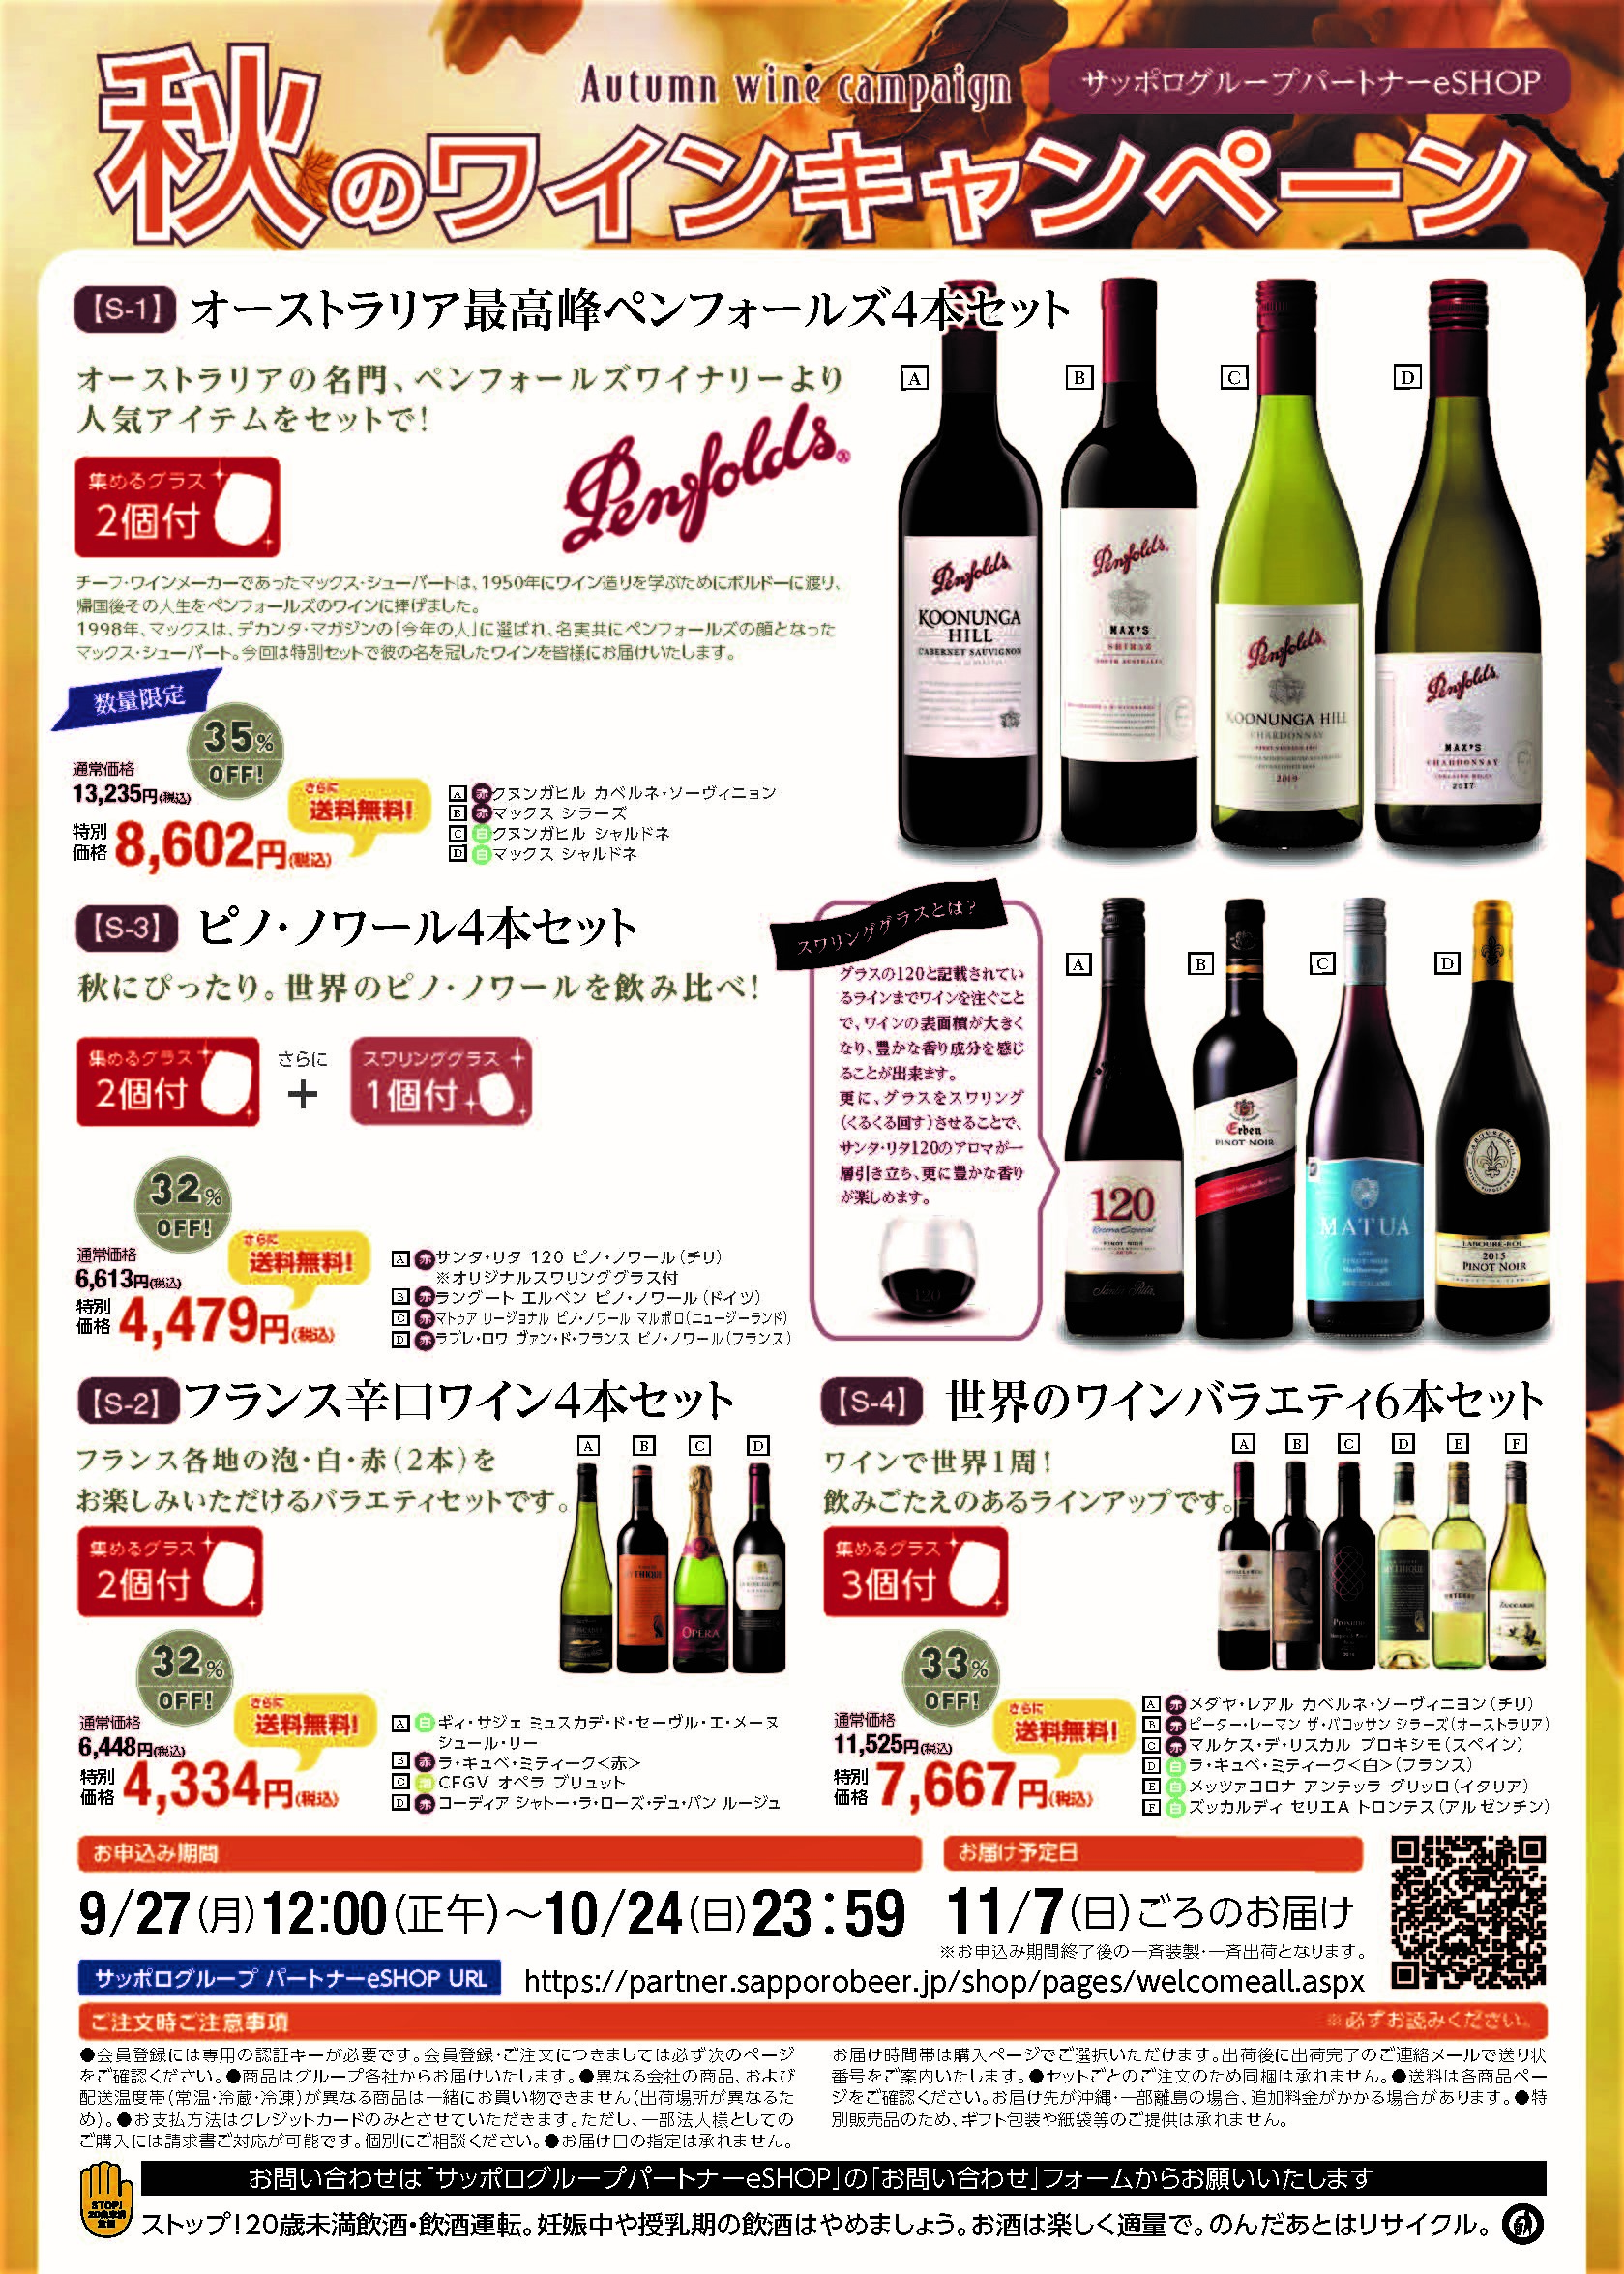 【HP限定】~10/24(日)23:59まで!送料無料!秋のワインキャンペーン